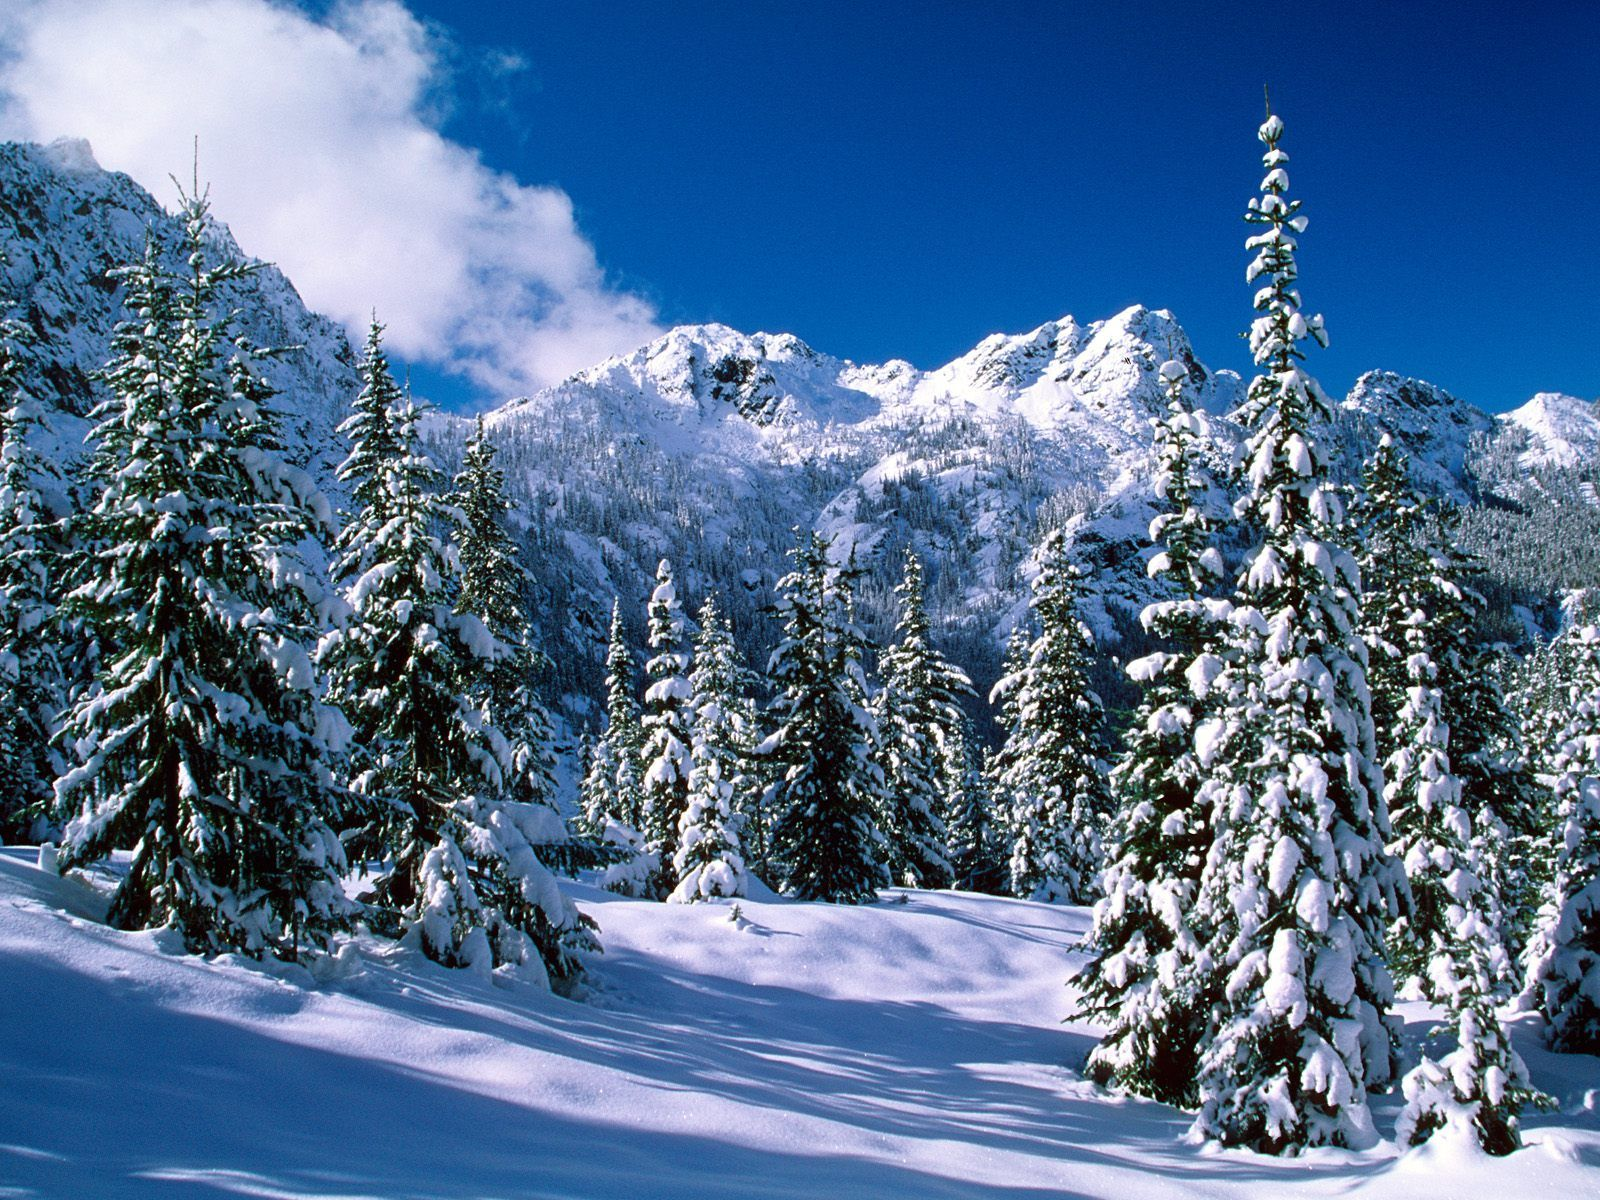 Hd wallpaper gallery - Snow Wallpaper On Best Hd Wallpapers Http Hdw9 Com Social